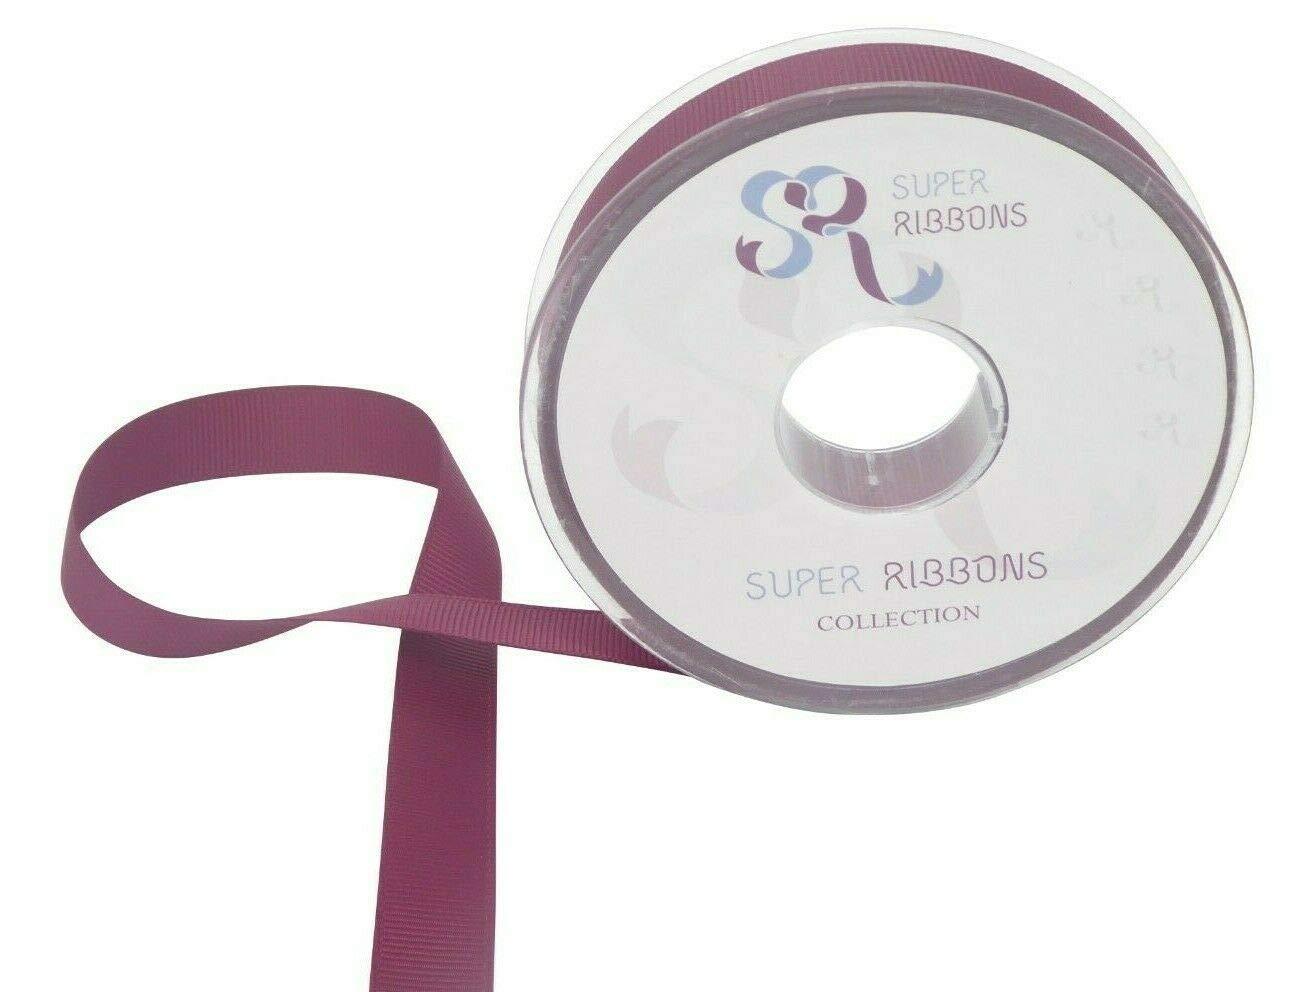 10 mm SR SUPER RIBBONS/®TM 15 mm 3 mm x 50 m 6 mm 3 mm nastro grosgrain di qualit/à 25 mm e 40 mm Hot Pink 20//50 metri su bobine di plastica dura